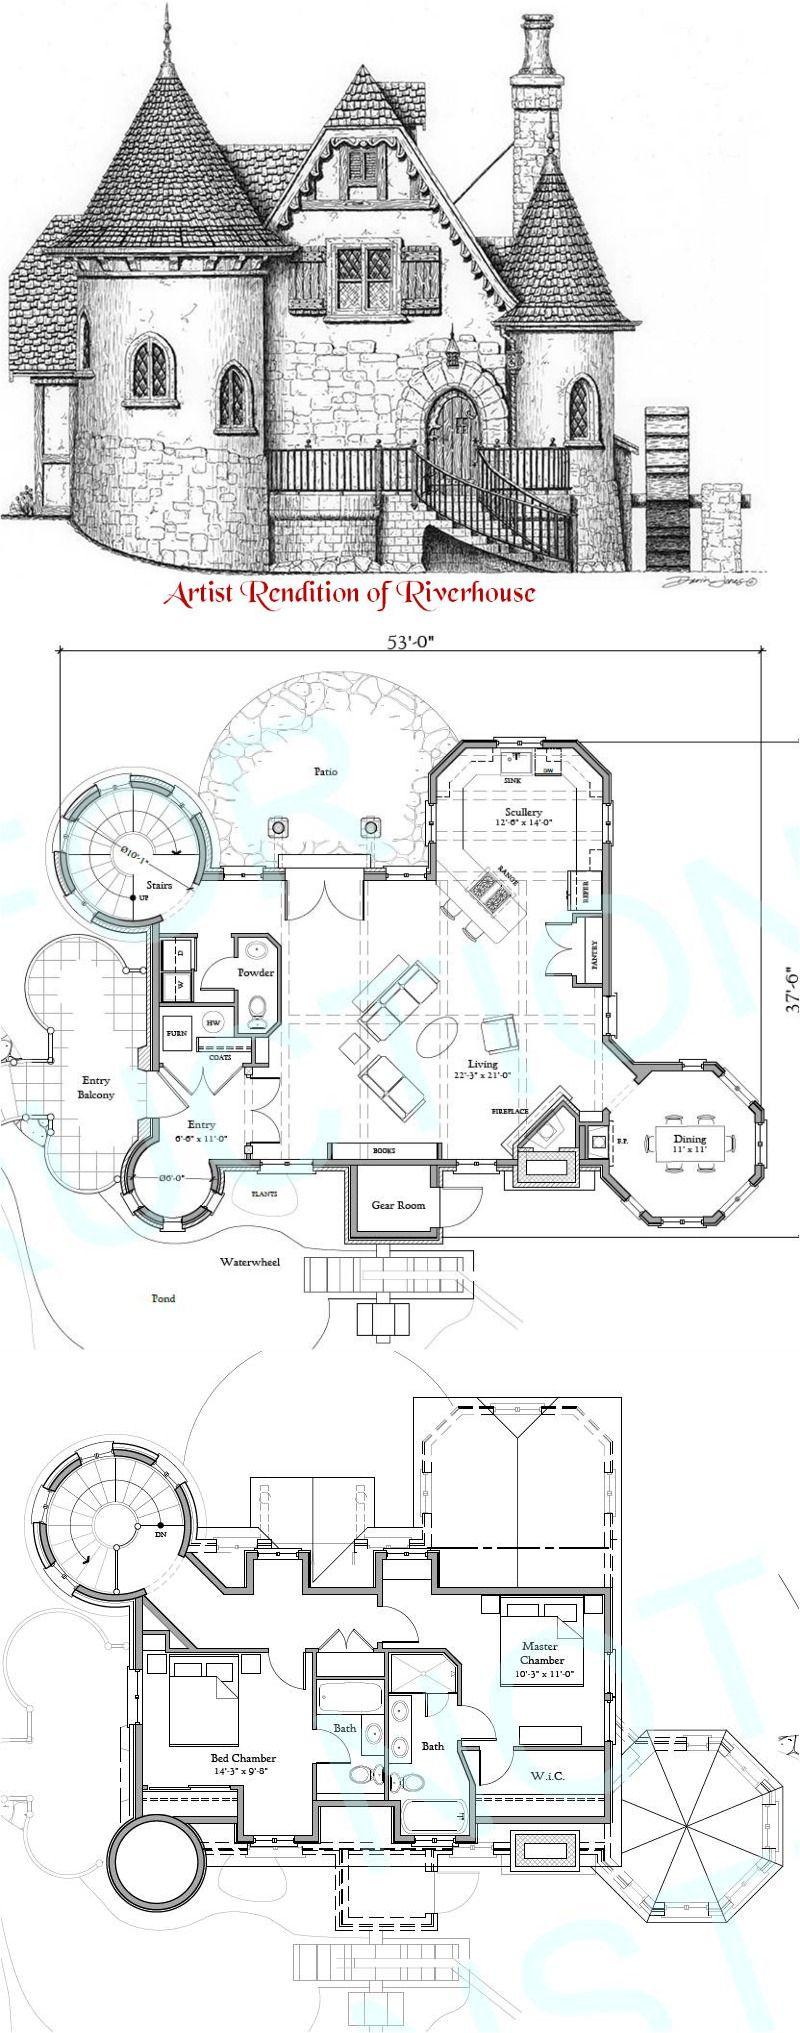 Riverhouse Storybook Castle House Plans Storybook House Plan Storybook Homes